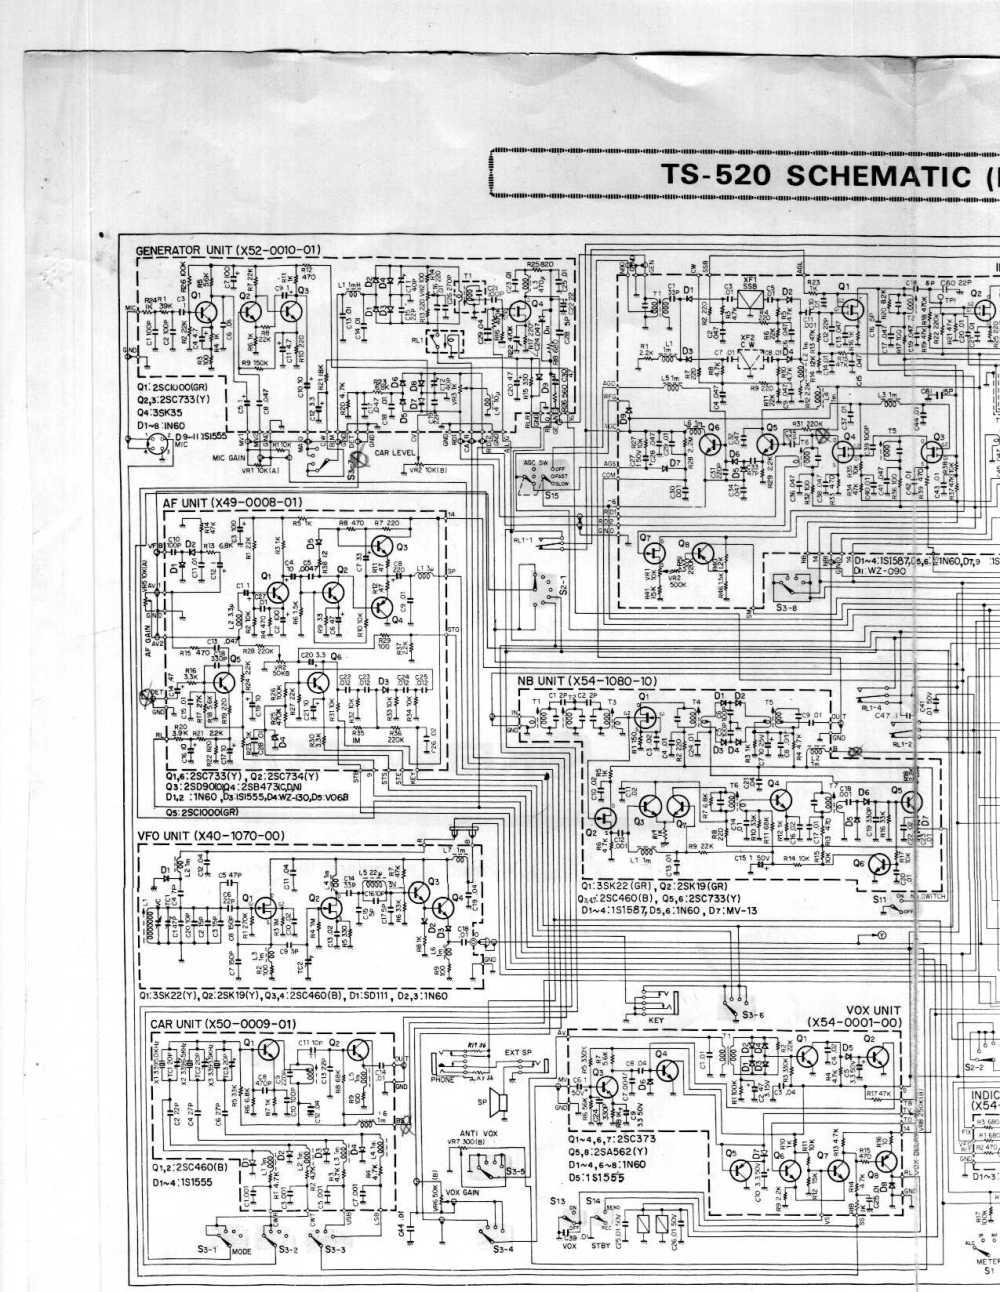 medium resolution of diagram as well kenwood ts 520 schematic diagram likewise kenwood ts kenwood ts 520 manual likewise kenwood mic wiring diagram on kenwood